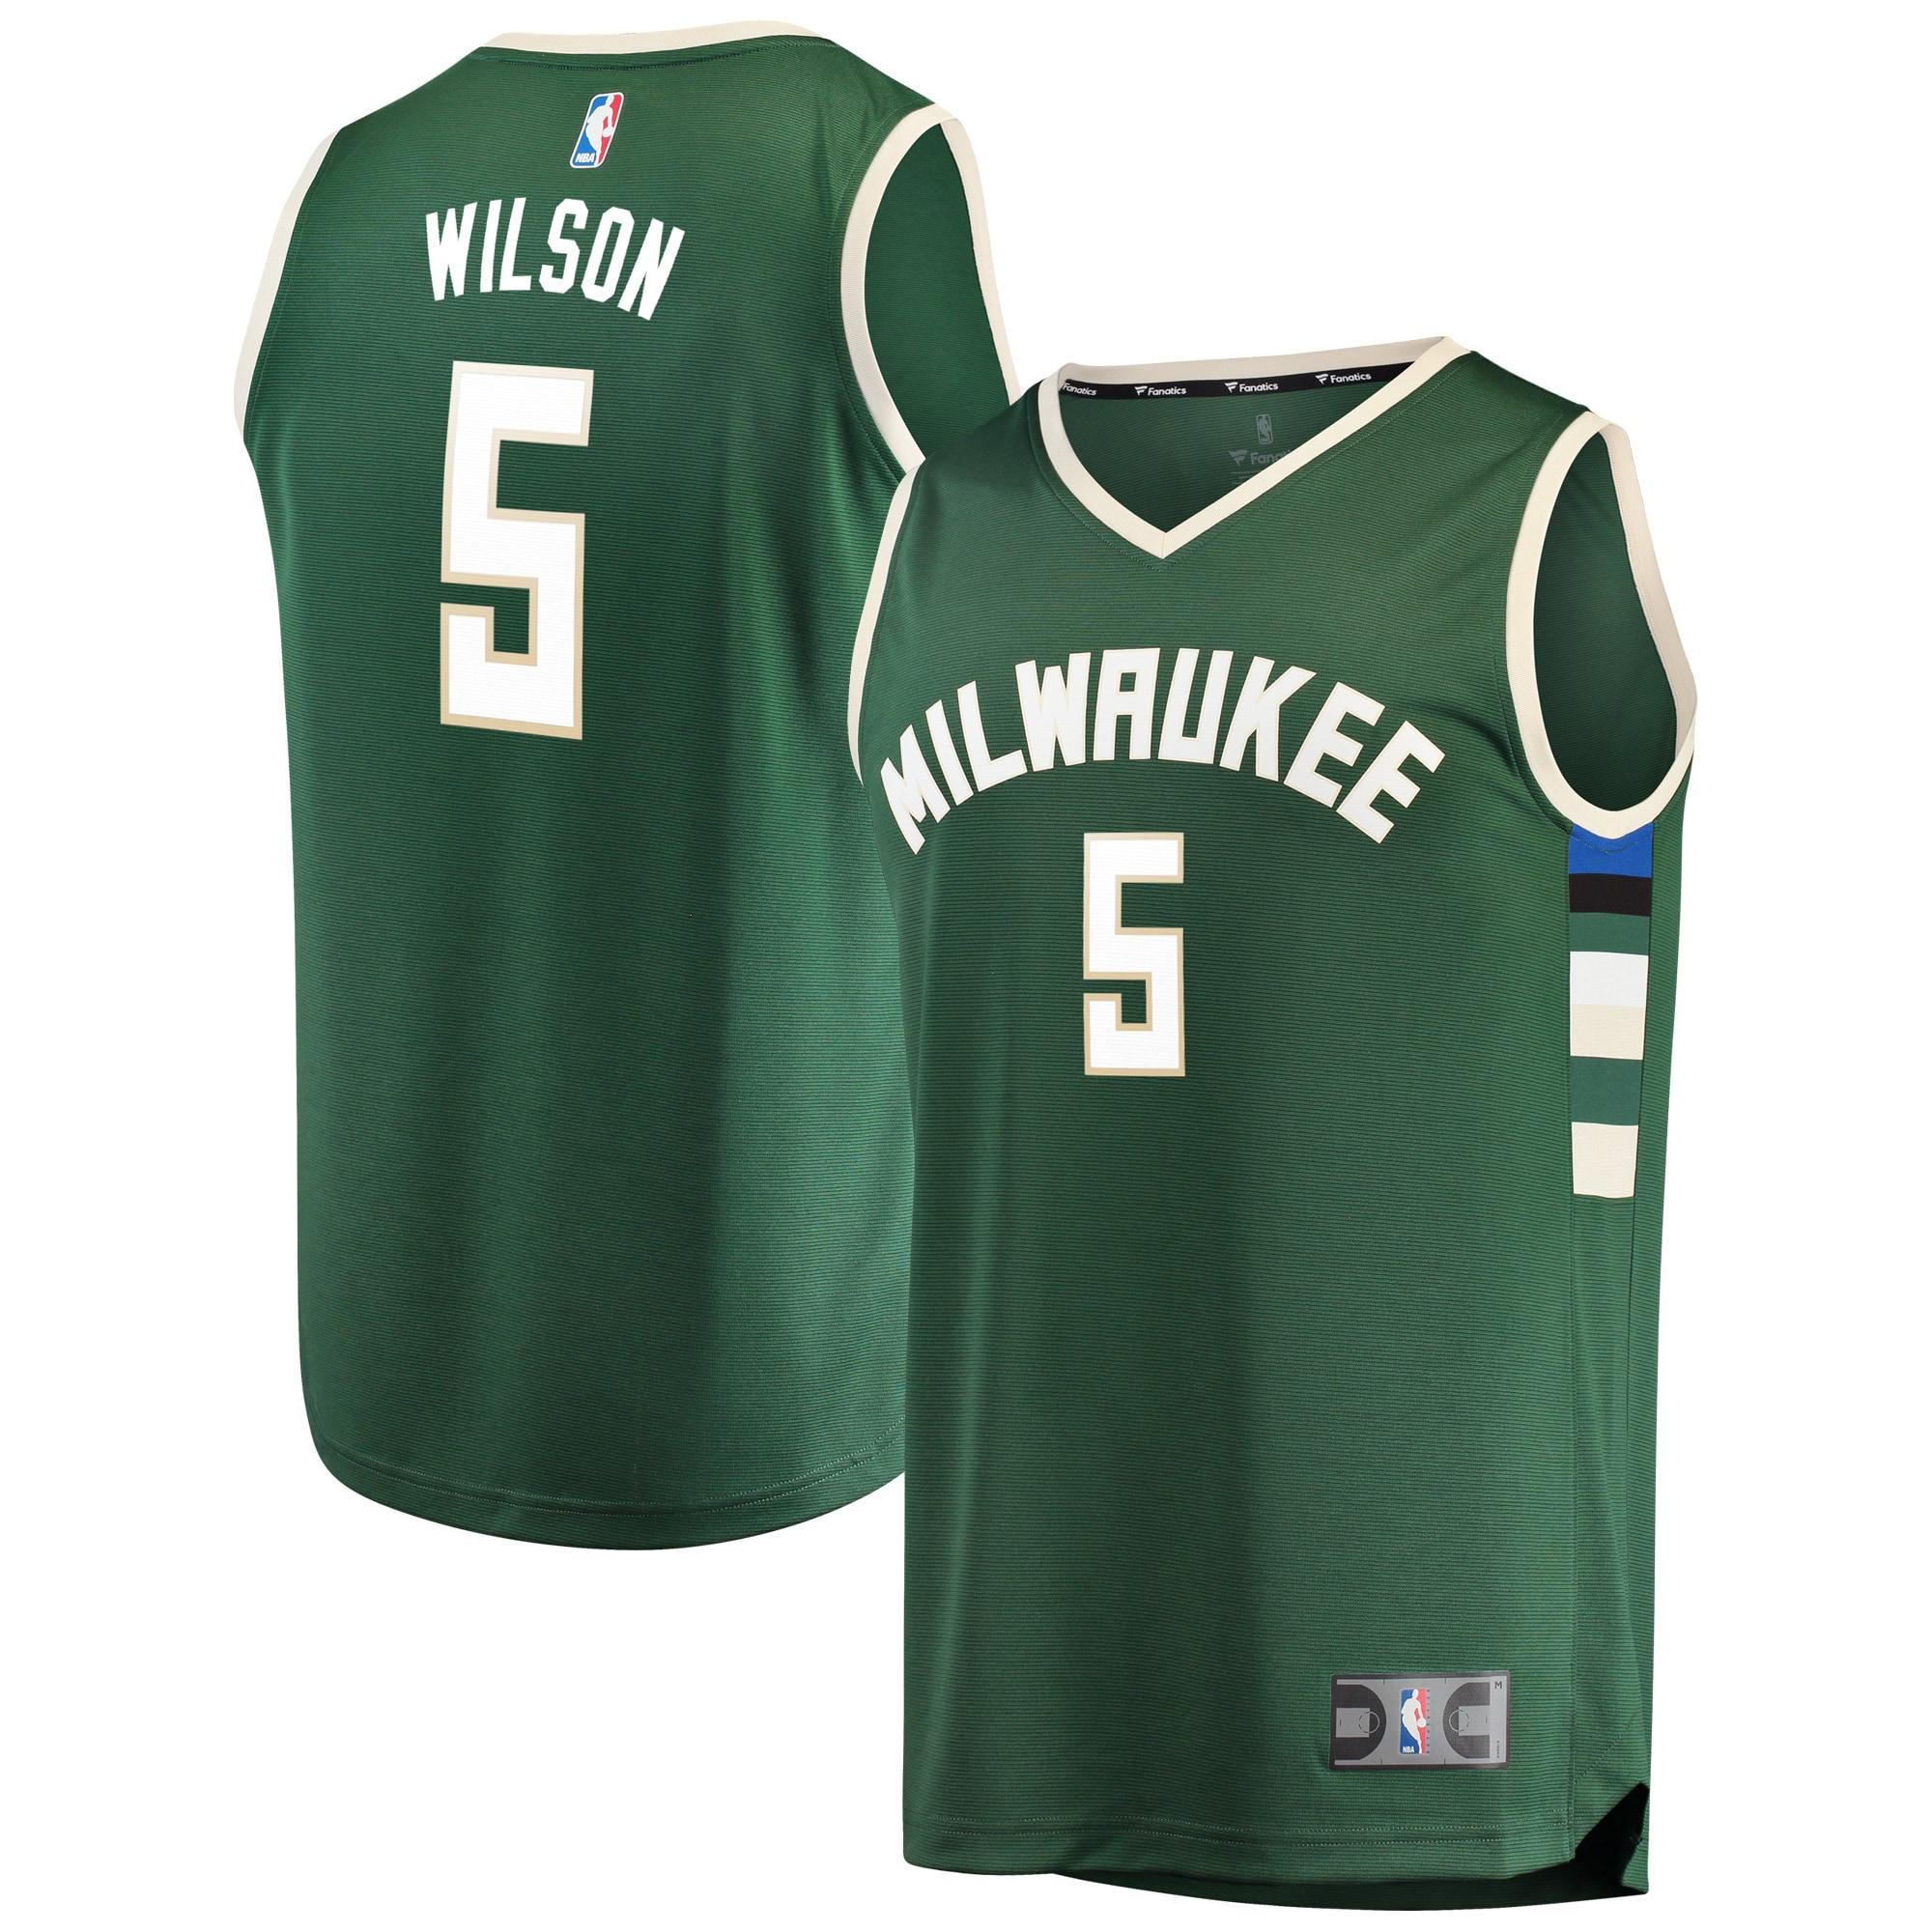 D.J. Wilson Milwaukee Bucks Fanatics Branded Fast Break Road Replica Player Jersey Green - Icon Edition